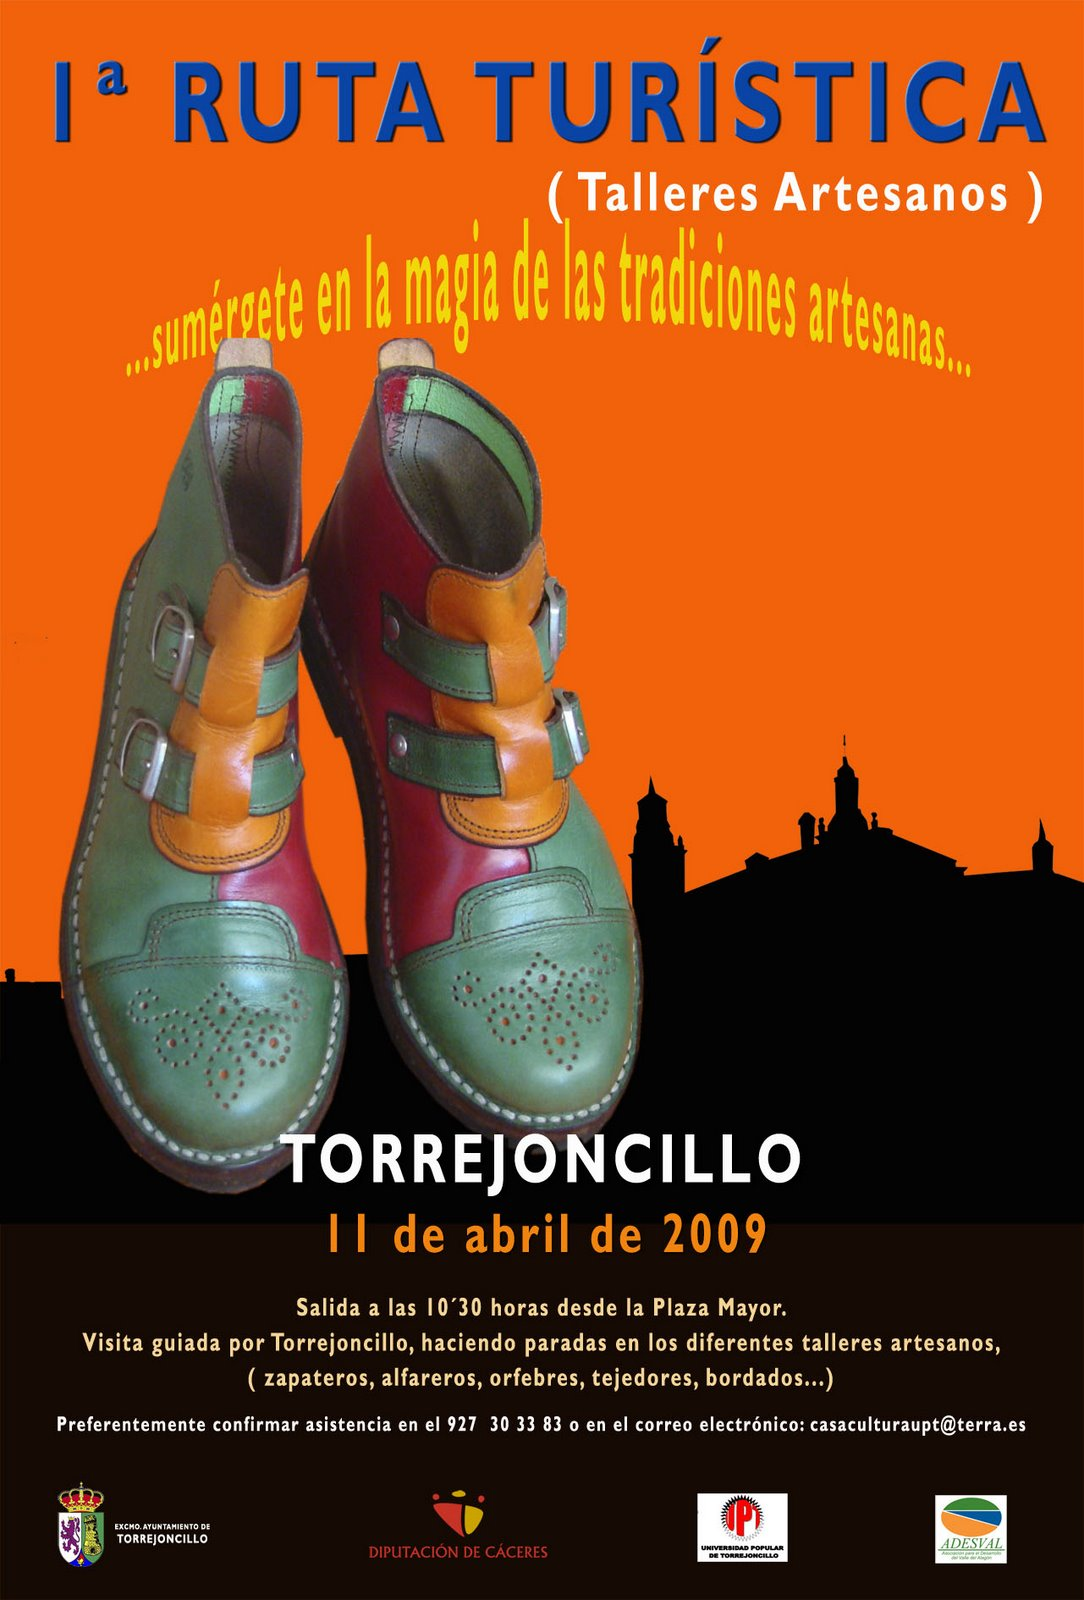 www.torrejoncillotodonoticias_antiguo_blog_0266